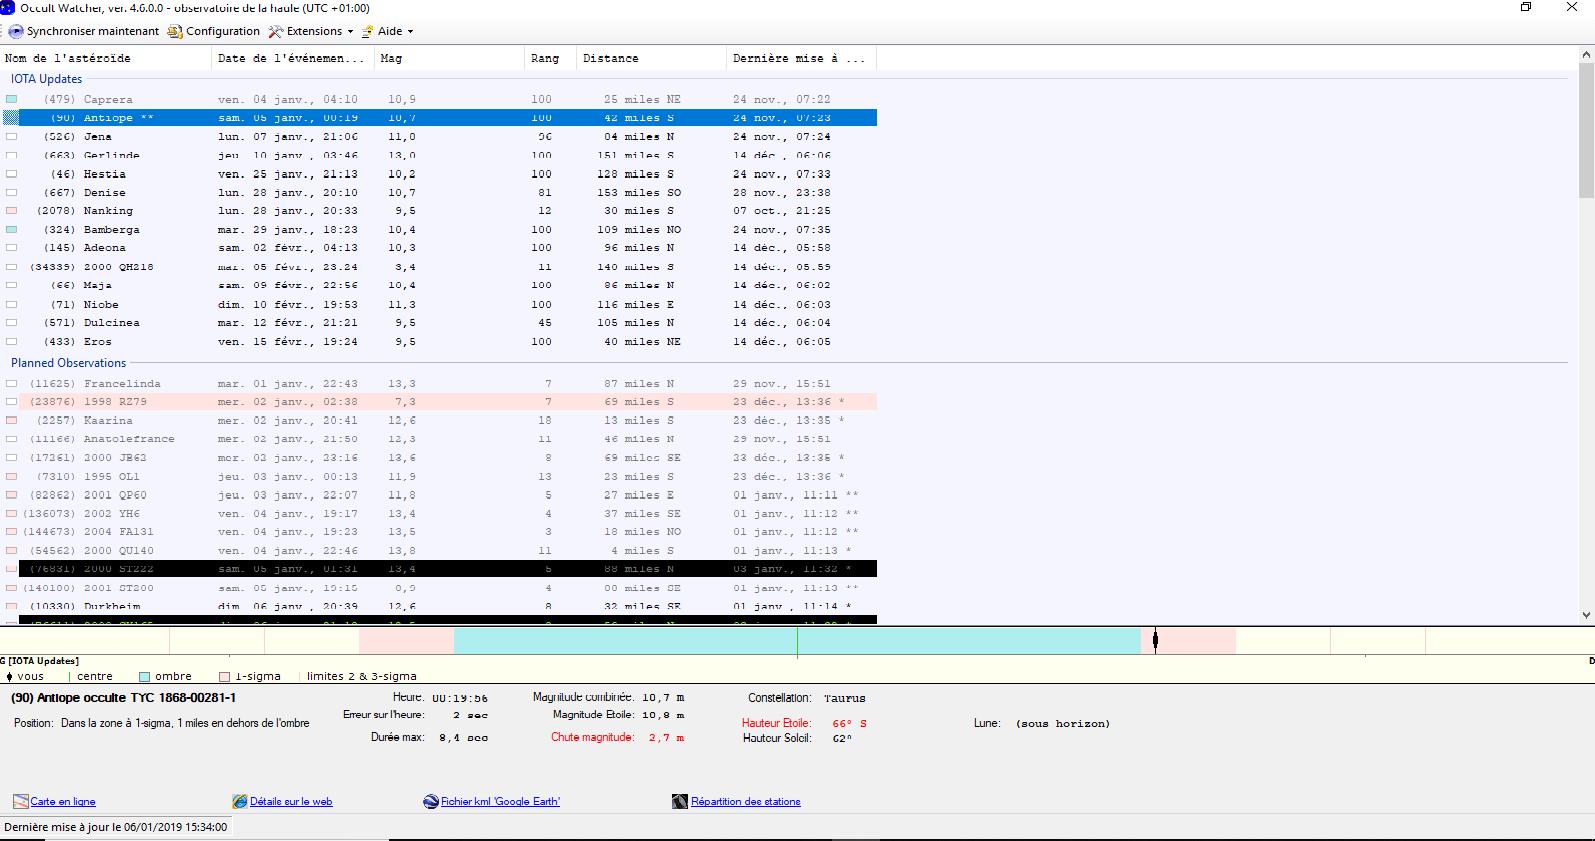 screen.png.1f7e660b31c6321cdfc70c2939dcd3e7.png